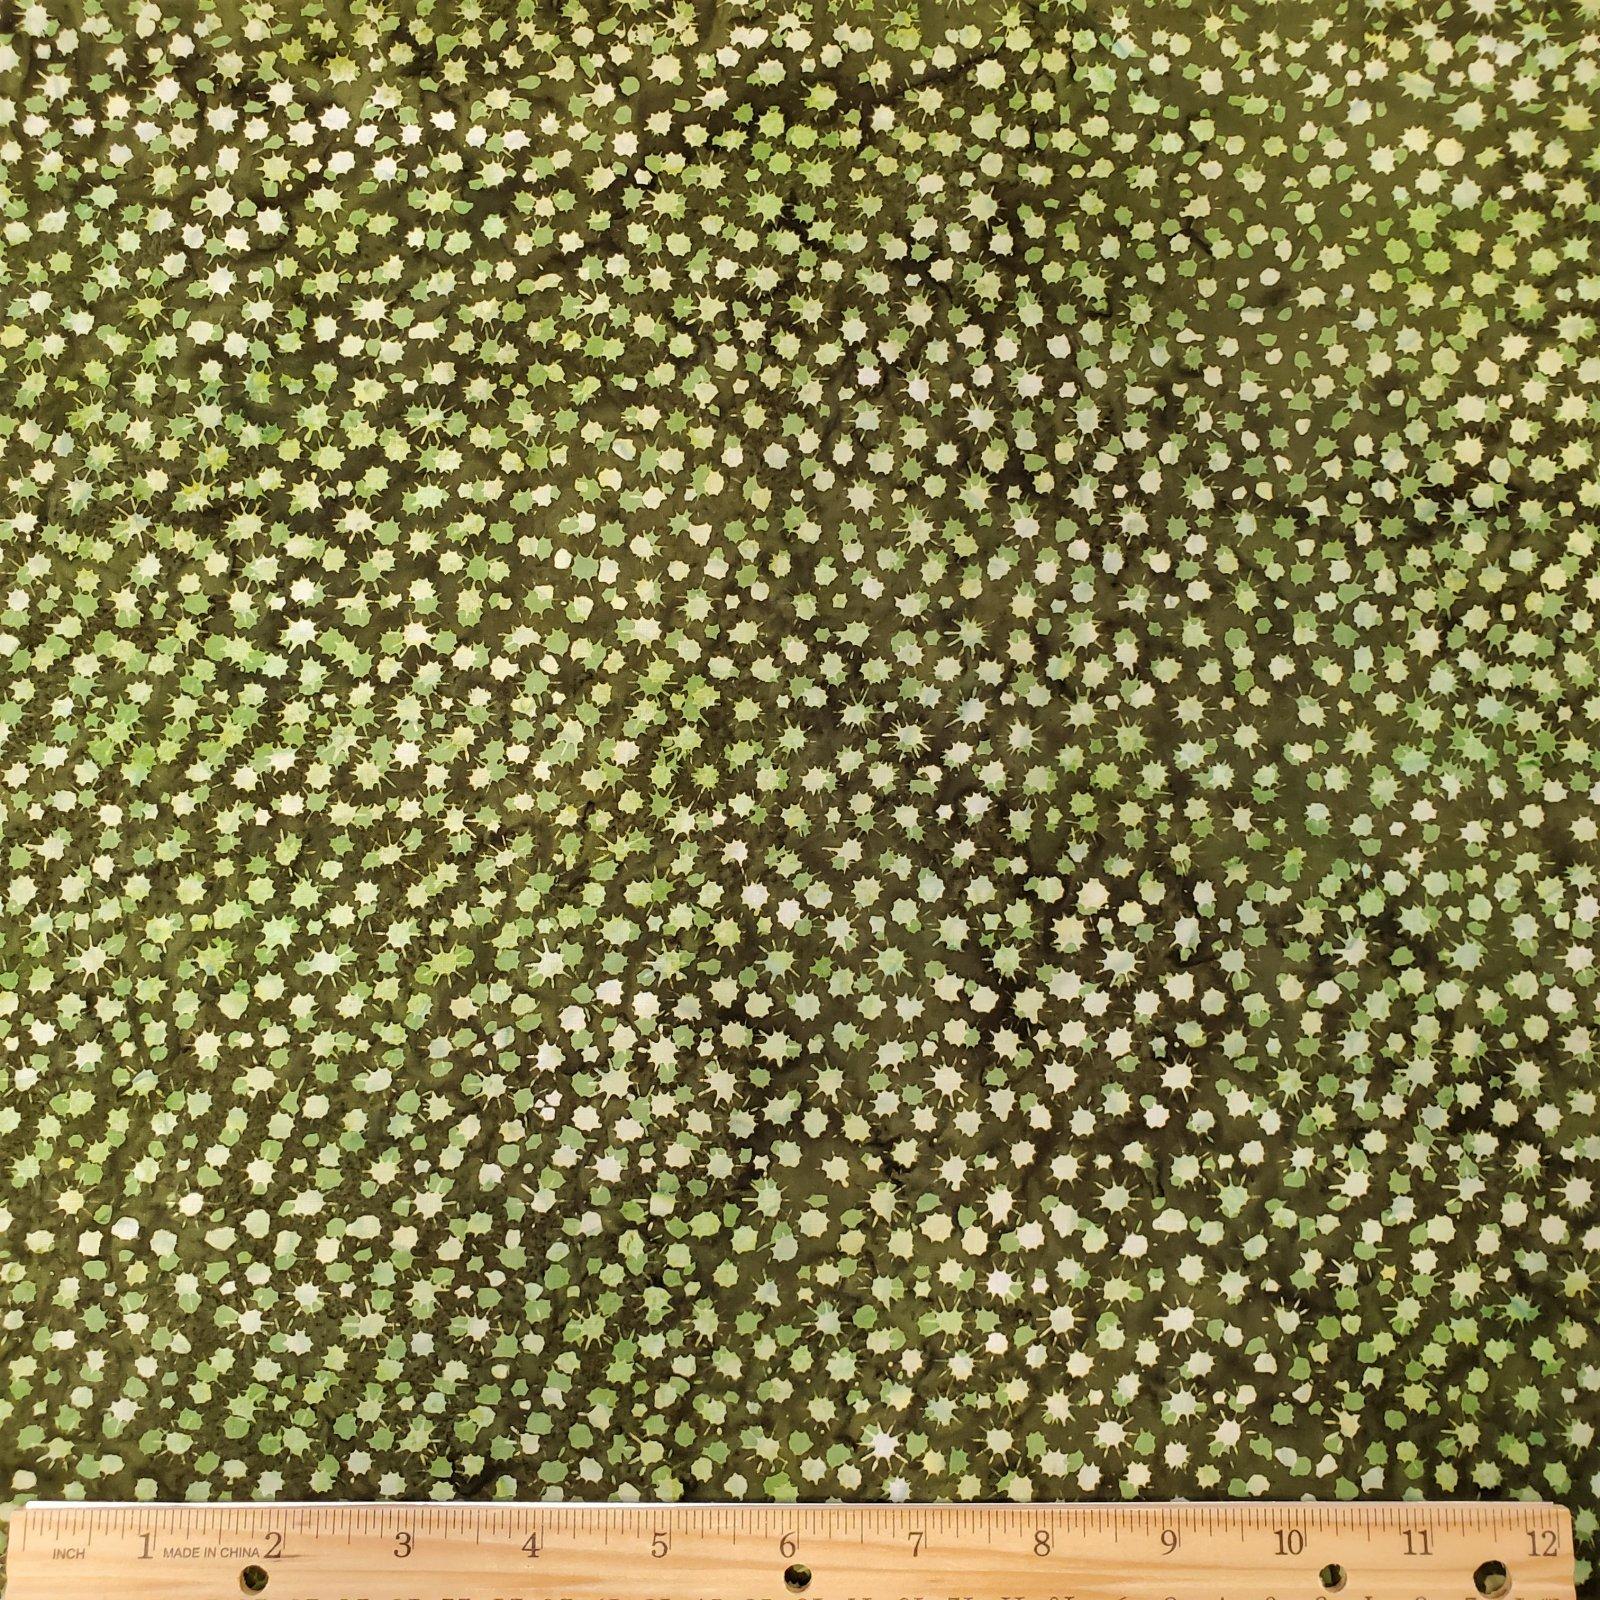 Bali Chop Custom Cactus Spines - Iguana - R2267-273